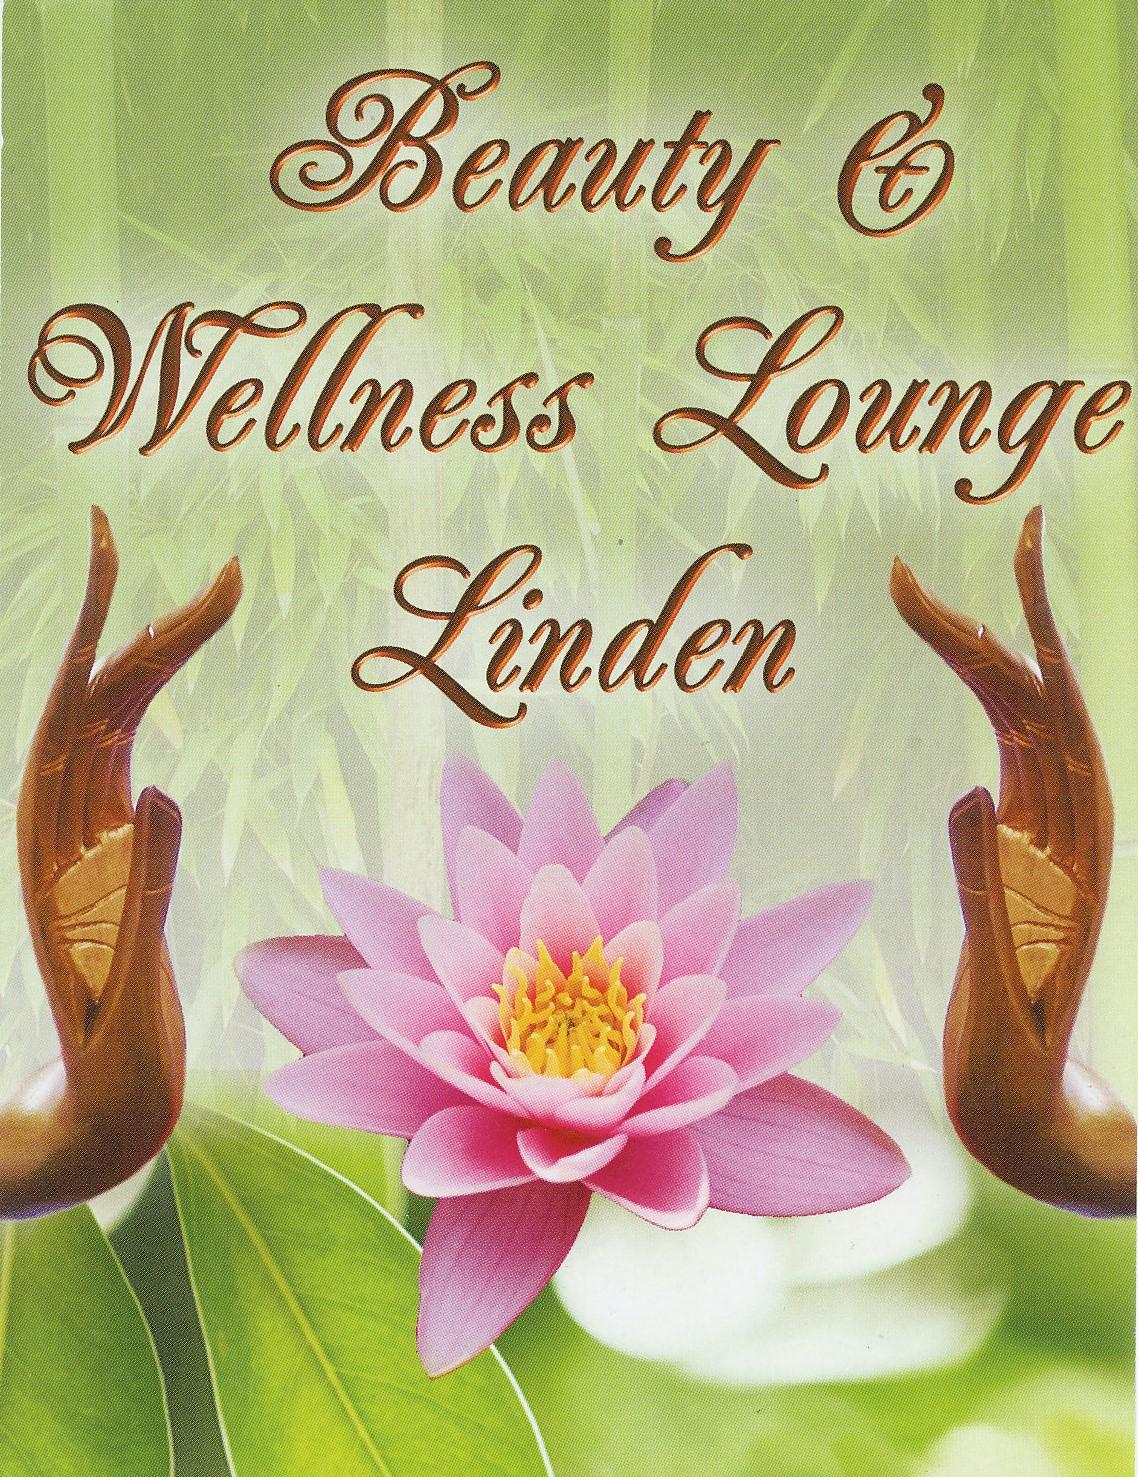 Beauty und Wellness Lounge Linden